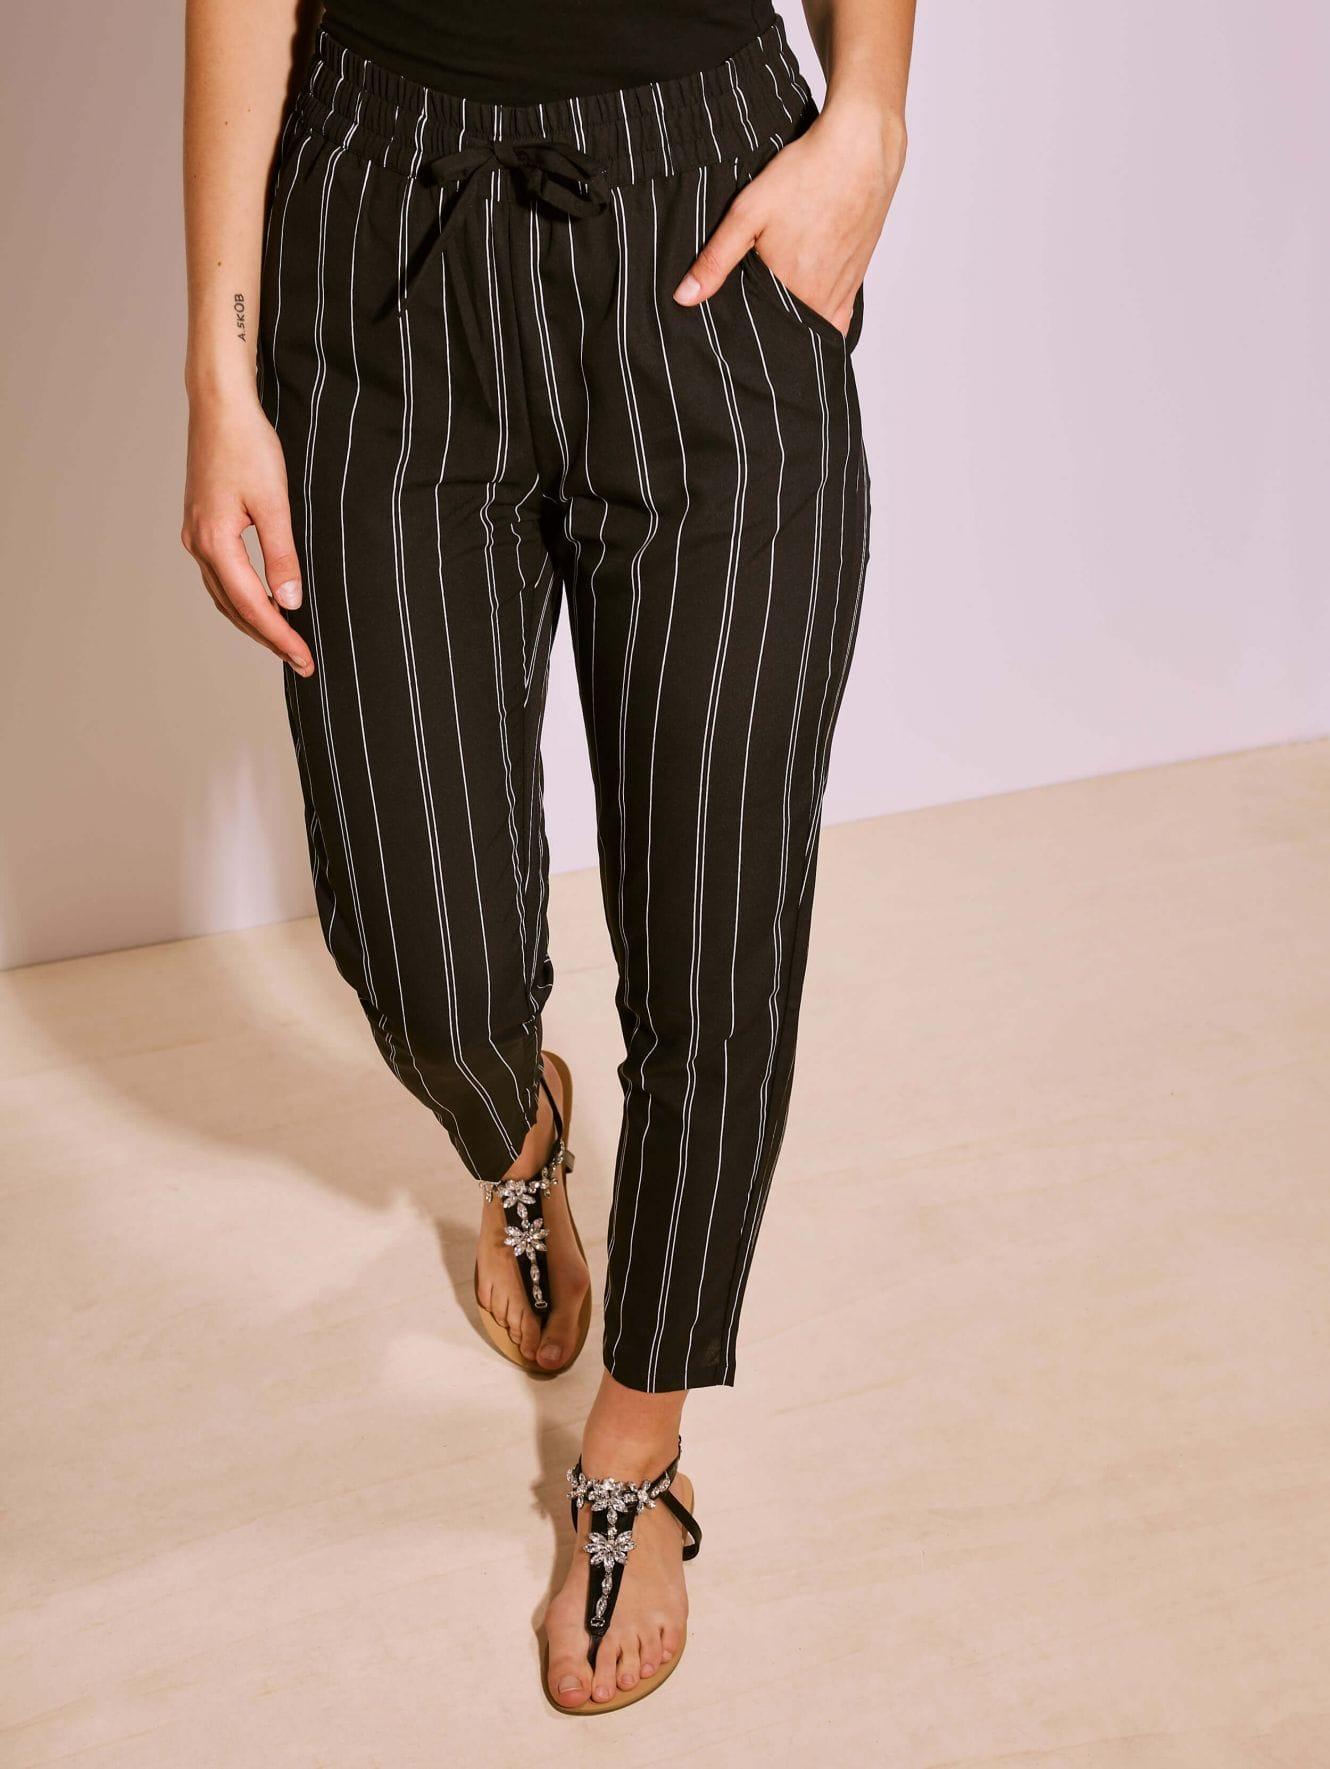 Pantalone Lungo Donna Terranova